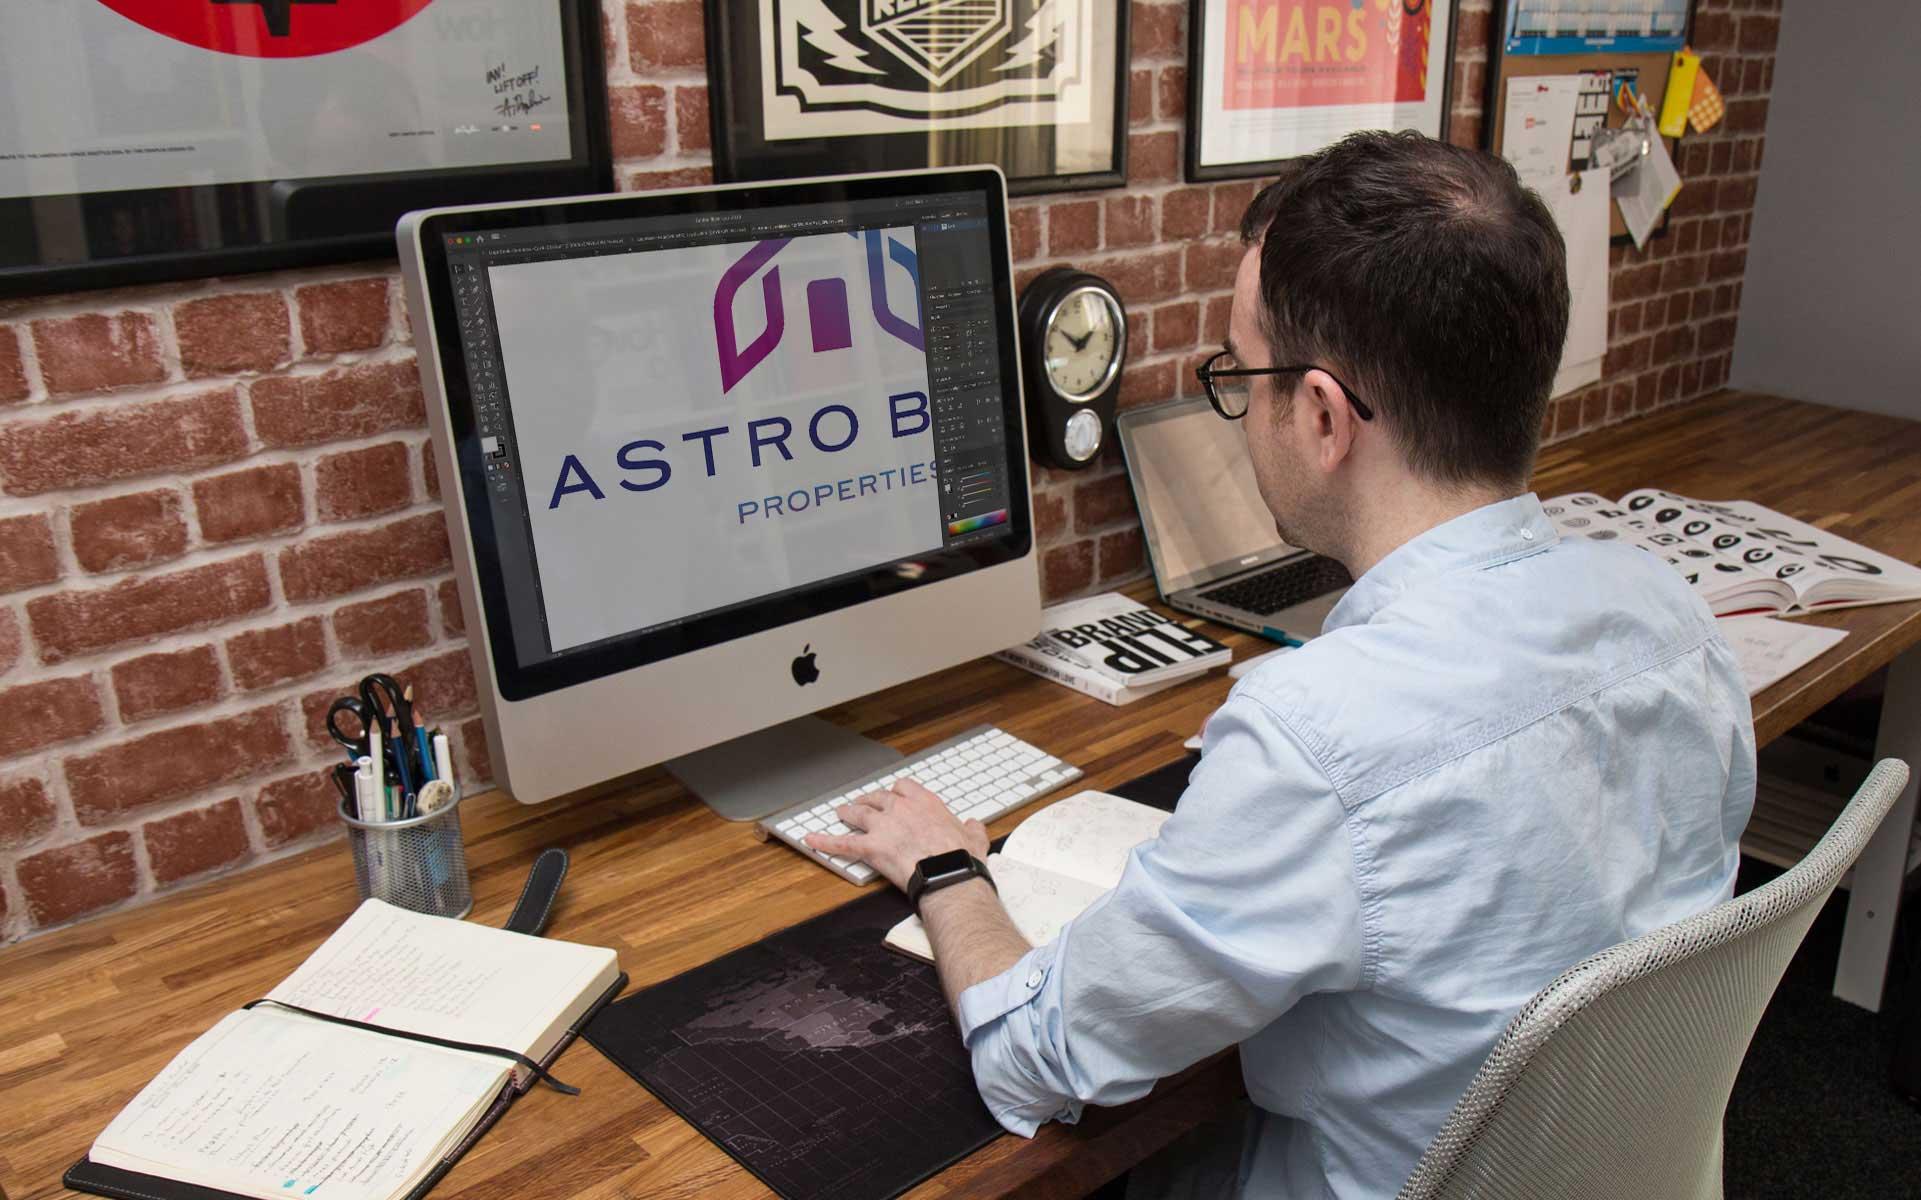 Working on a brand identity in Adobe Illustrator